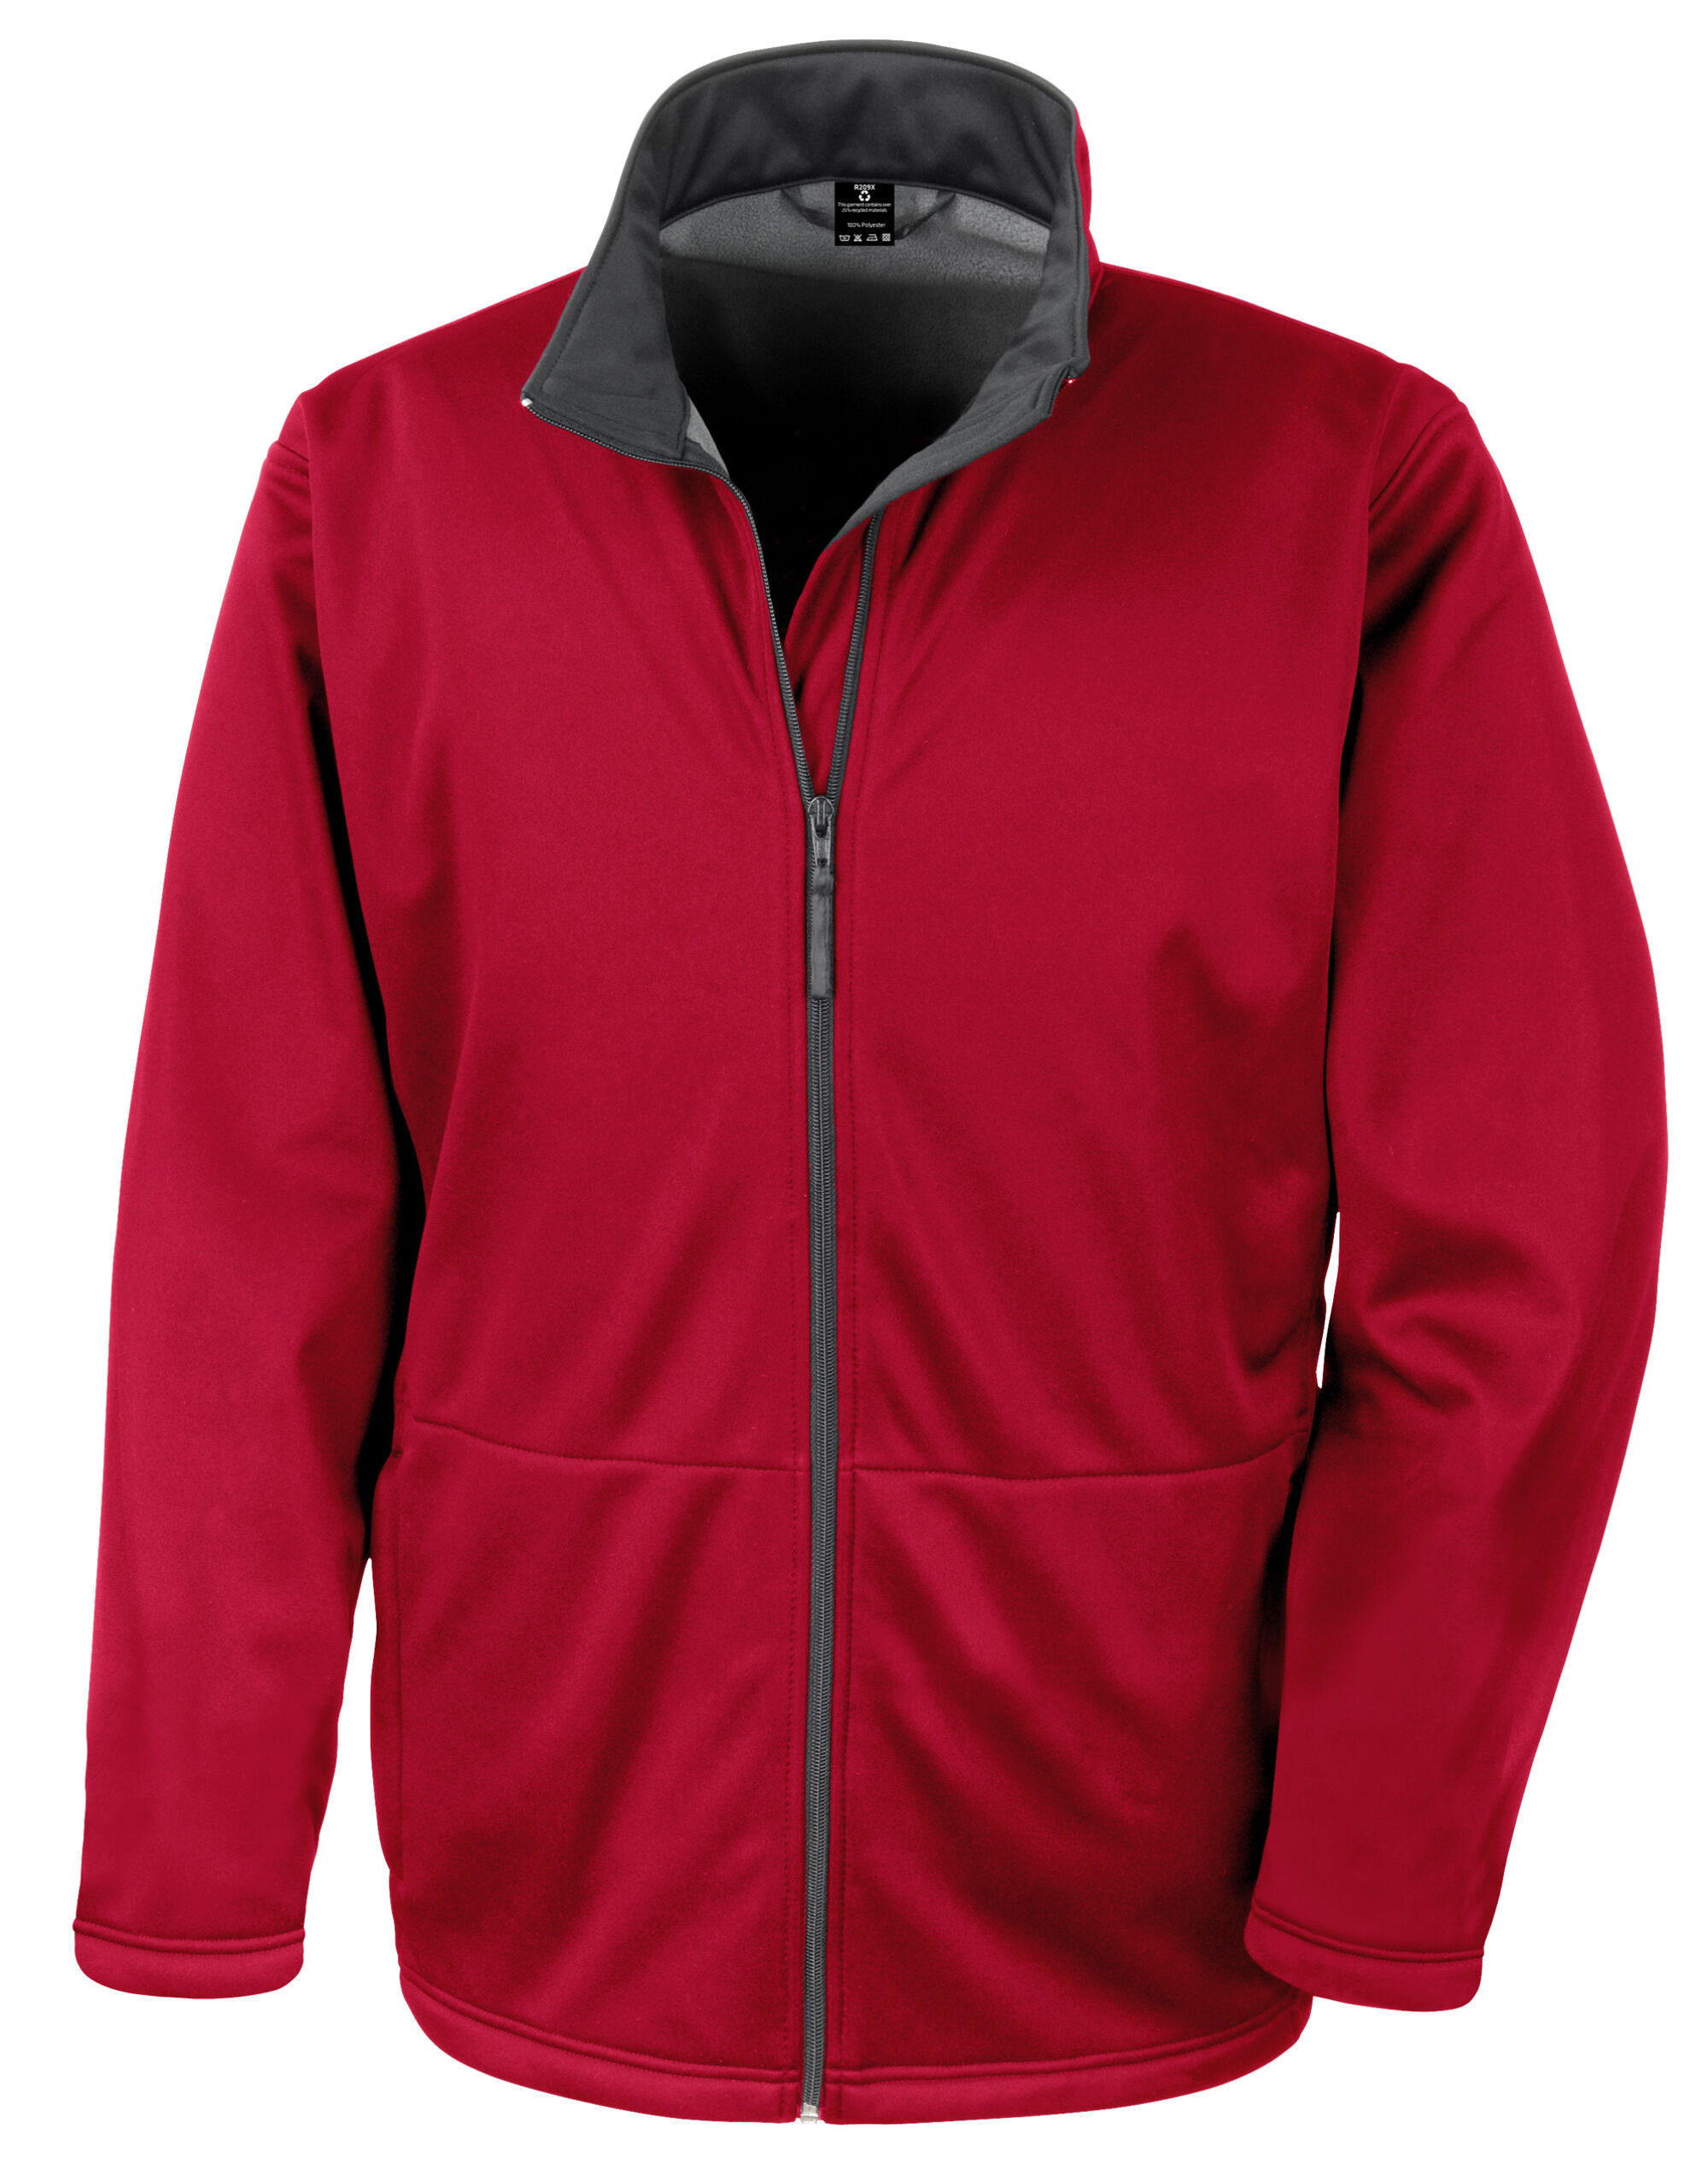 Core Men's Soft Shell Jacket